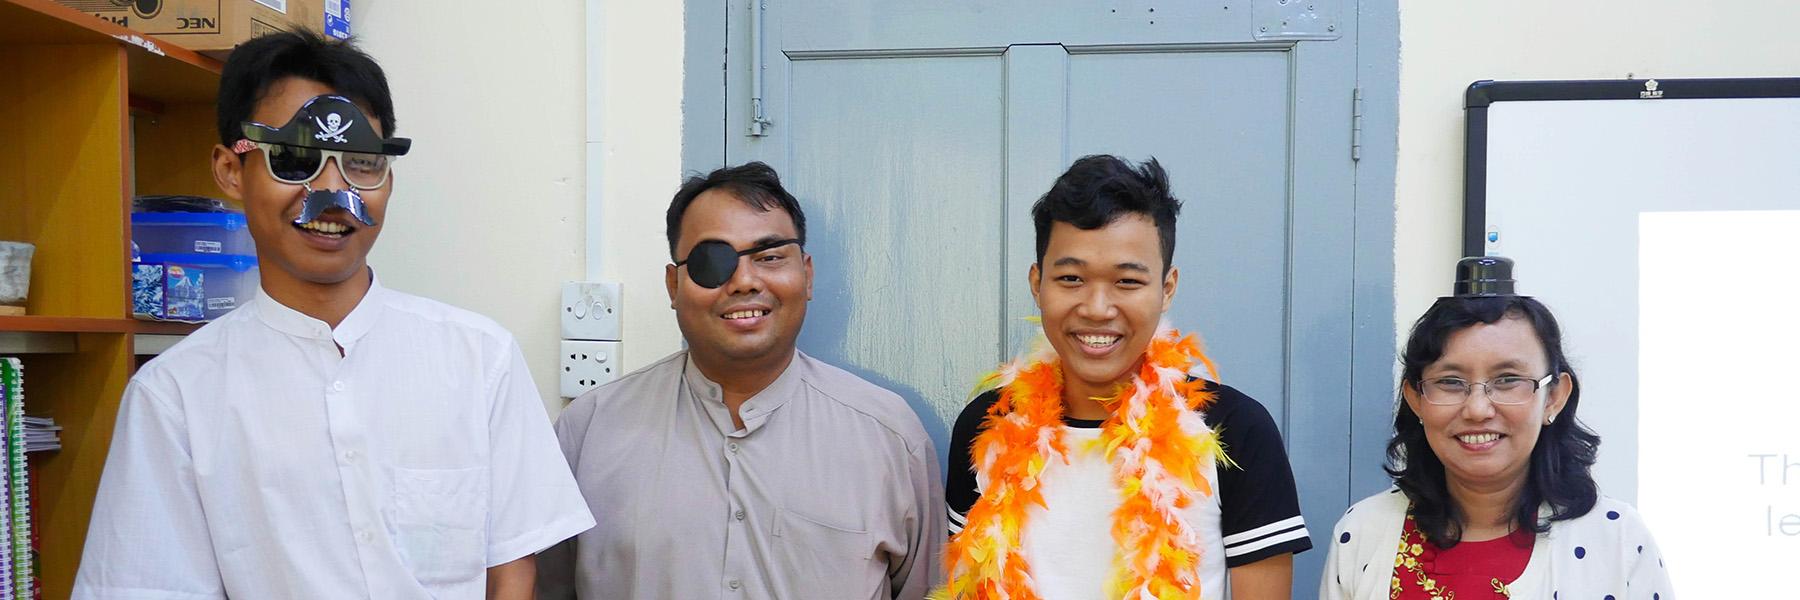 SILL Team In Yangon, Myanmar